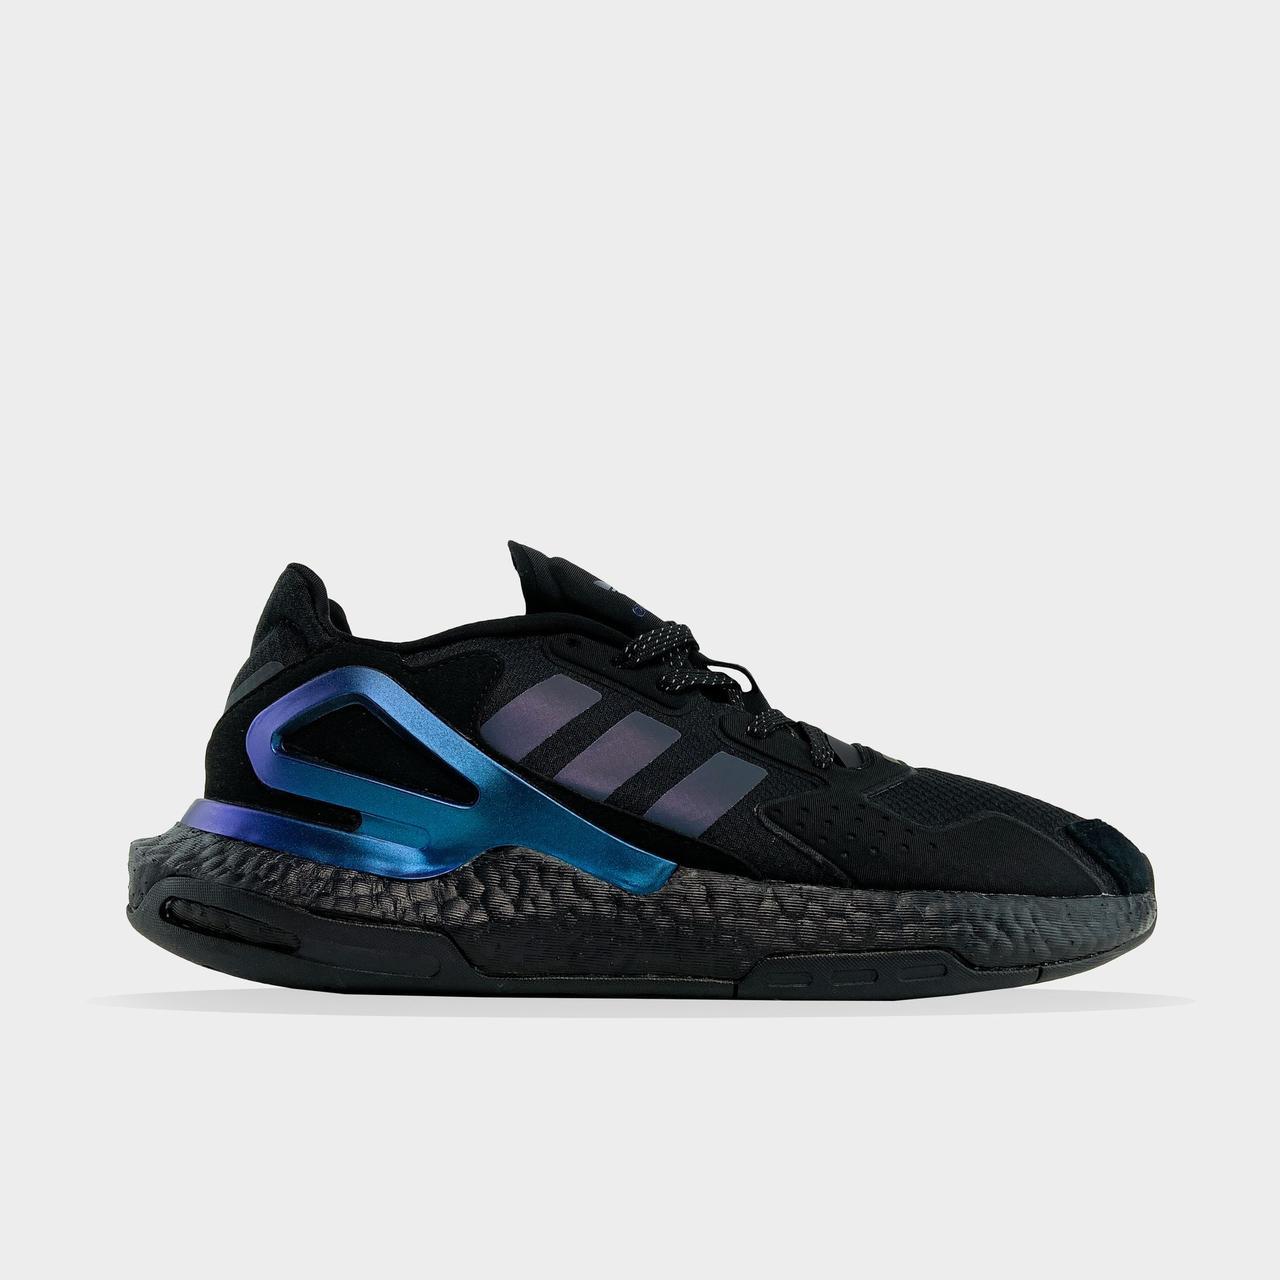 Adidas Day Jogger Black Reflective (Черный)